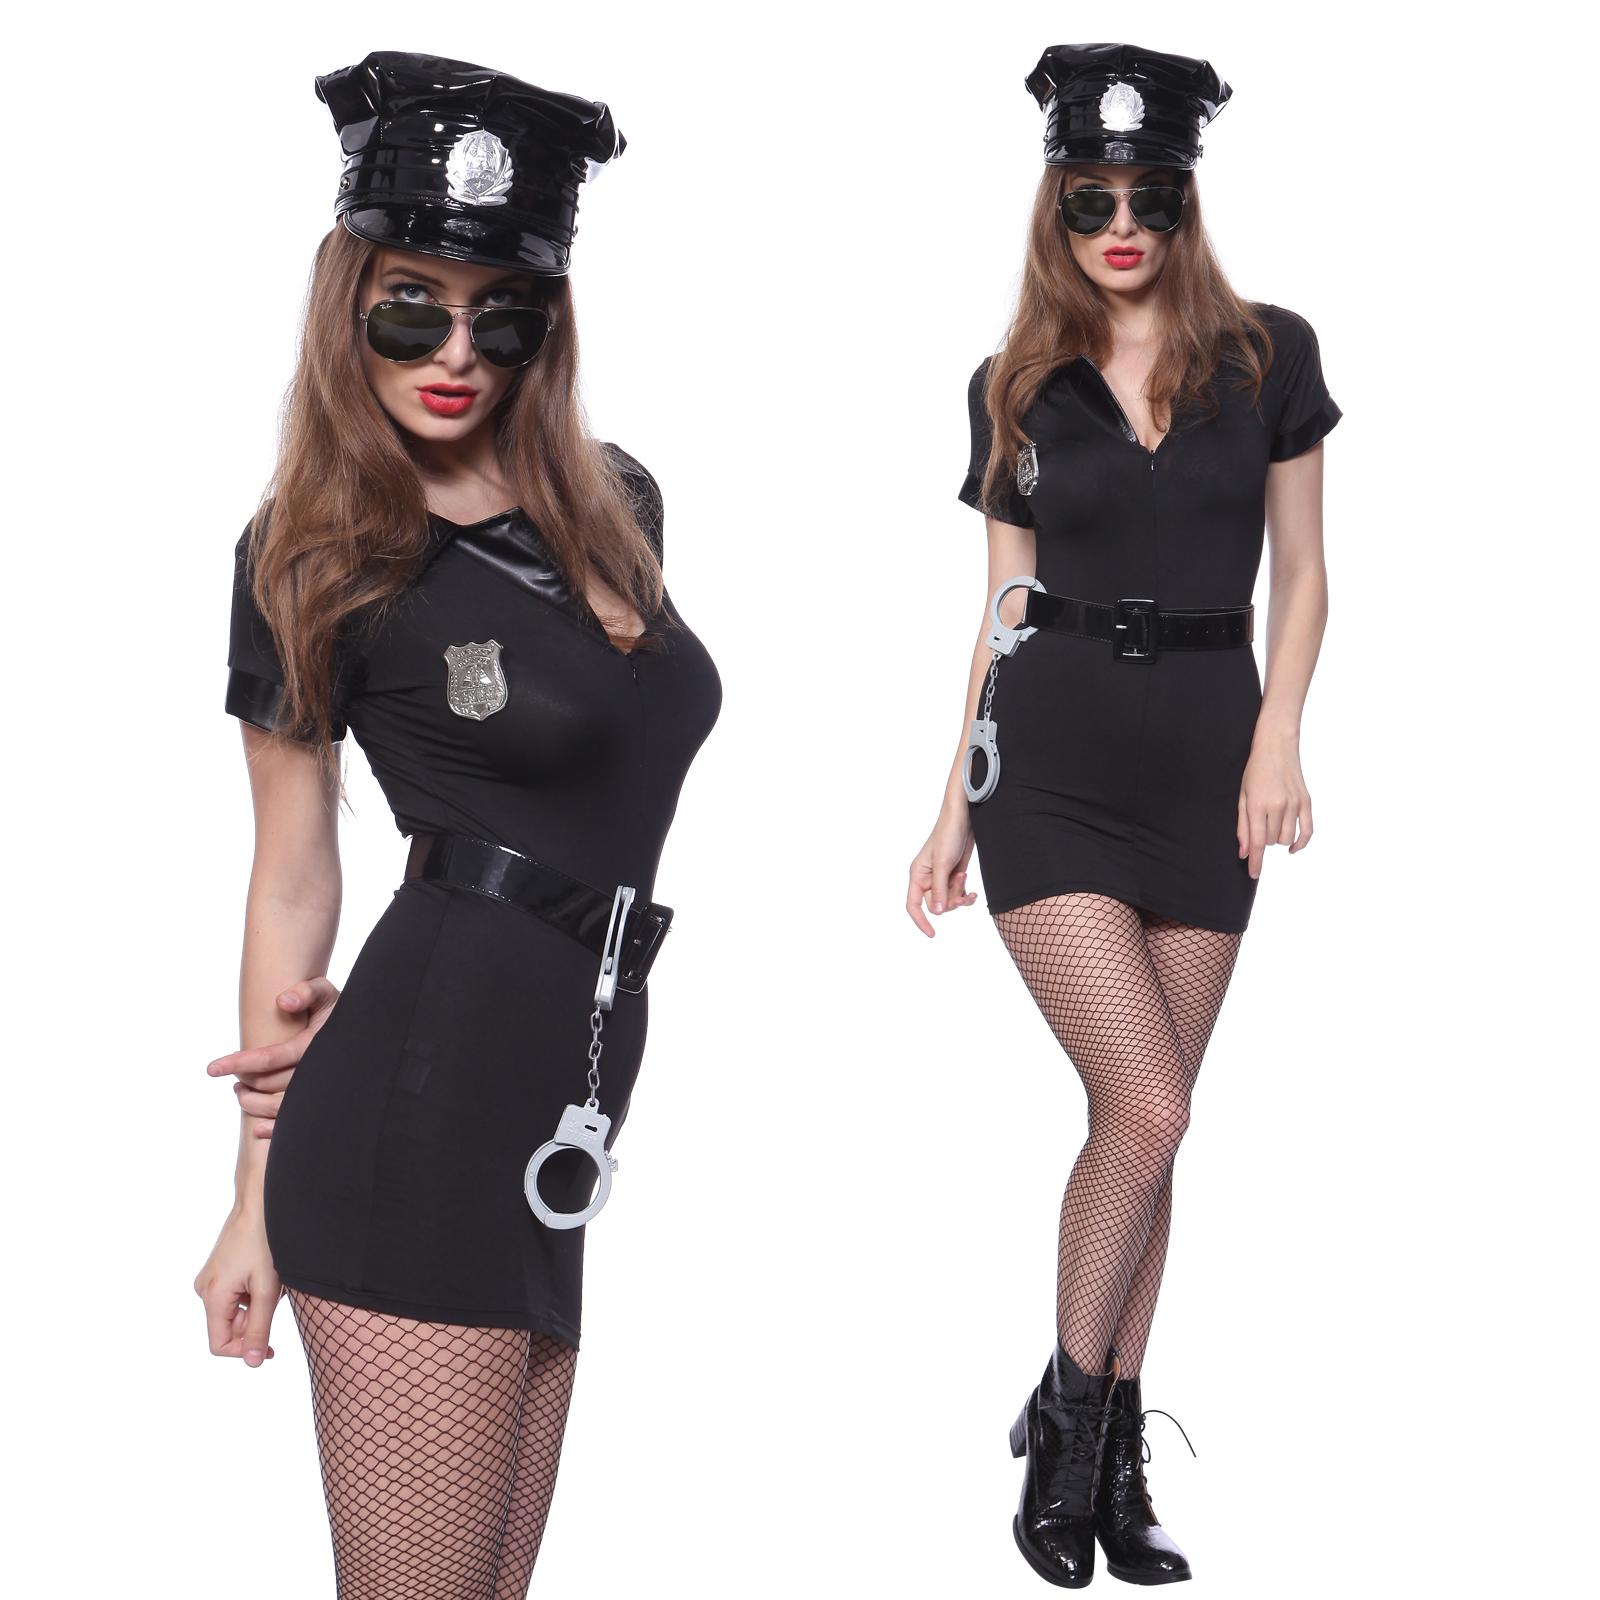 Plastic silver or gold Policeman Policewoman Handcuffs Fancy Dress